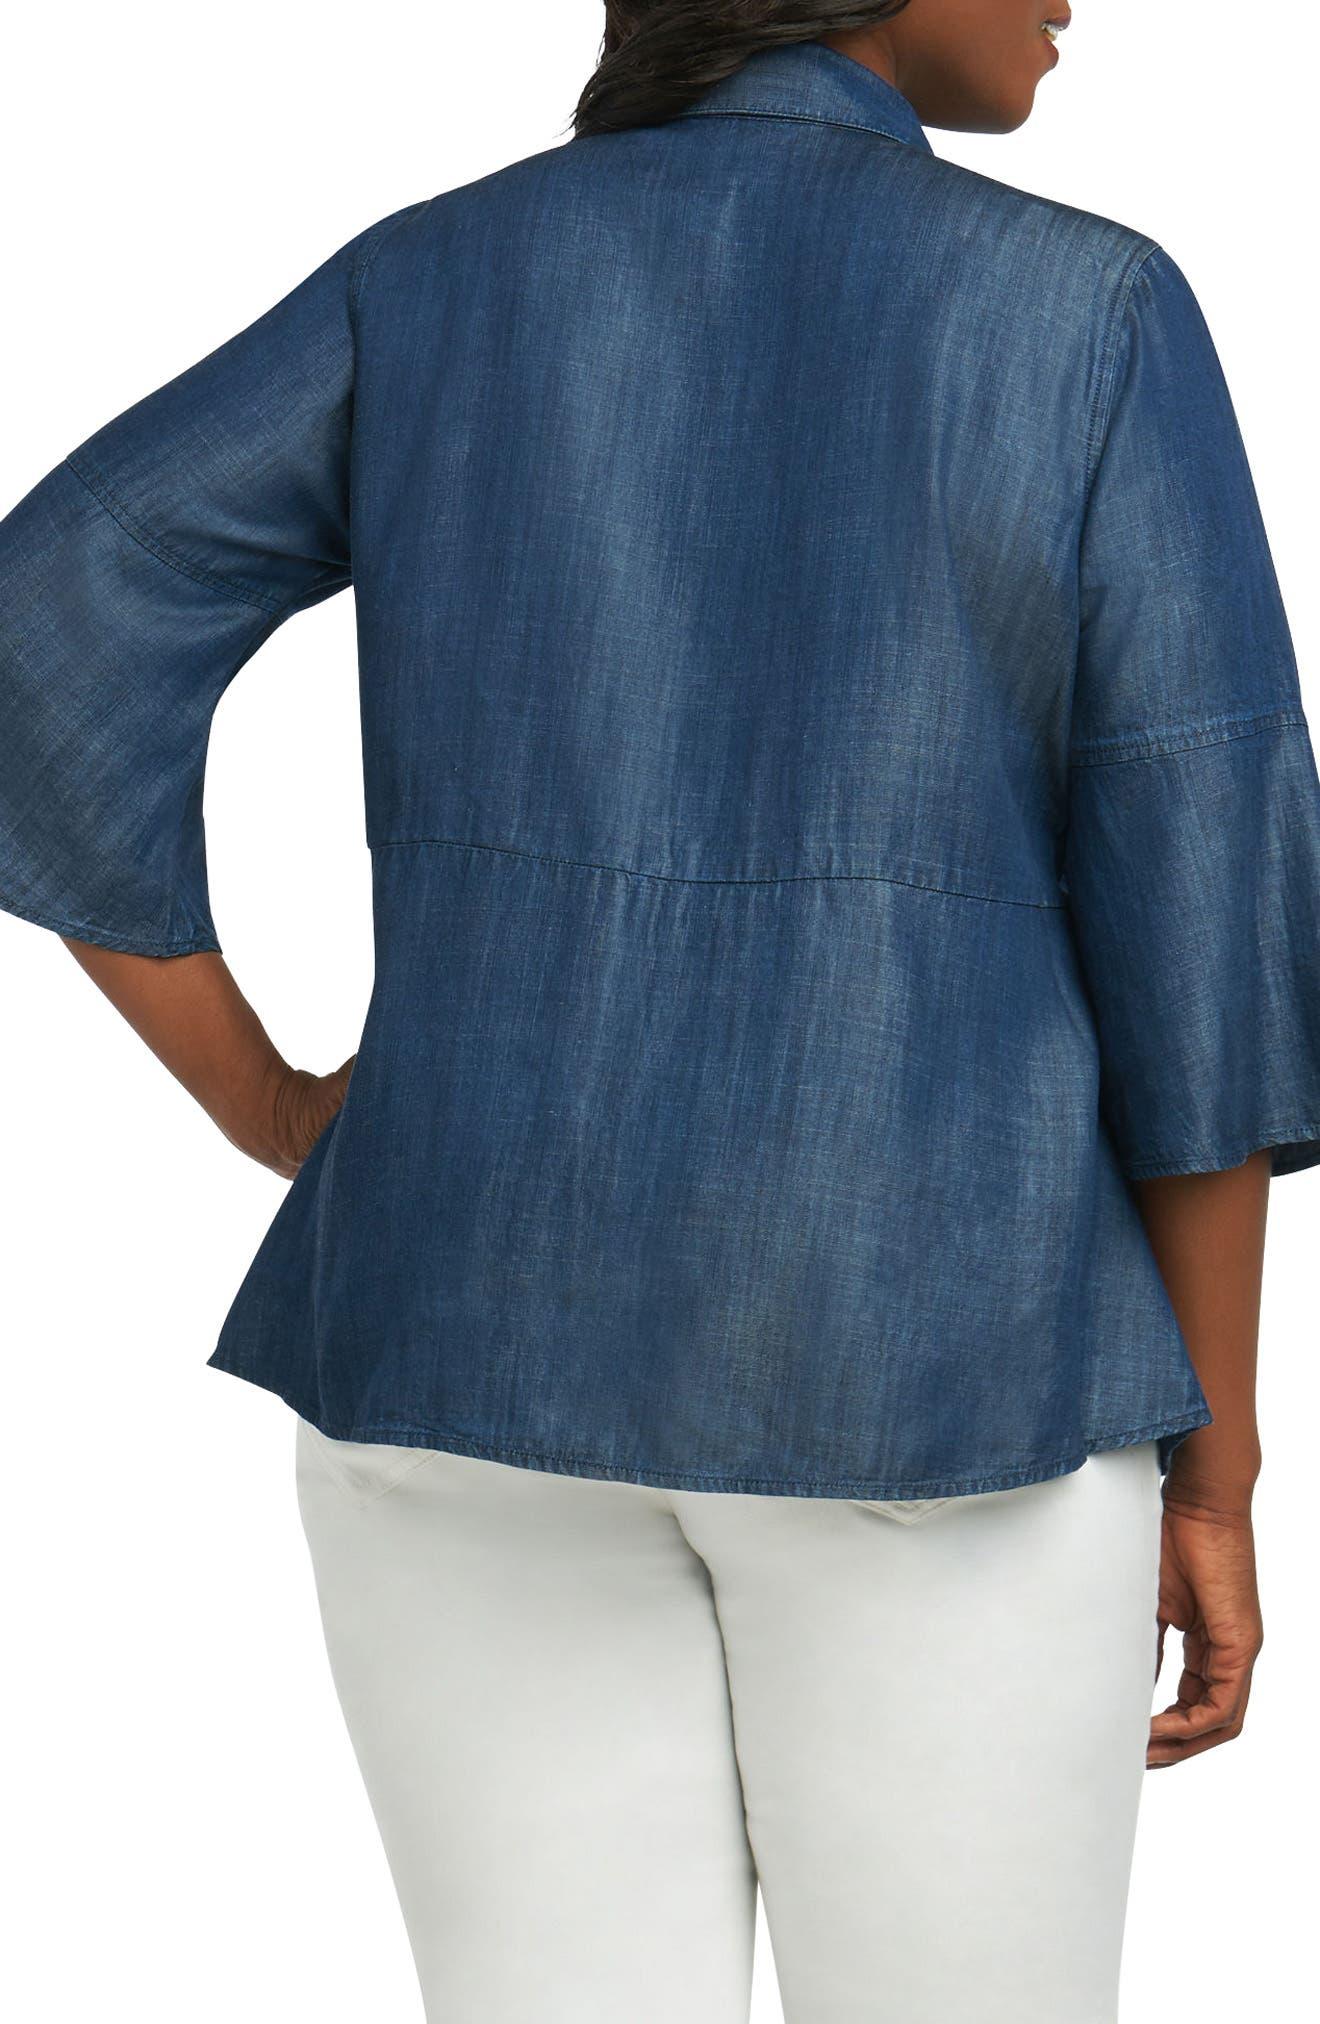 Estelle Chambray Shirt,                             Alternate thumbnail 2, color,                             Navy